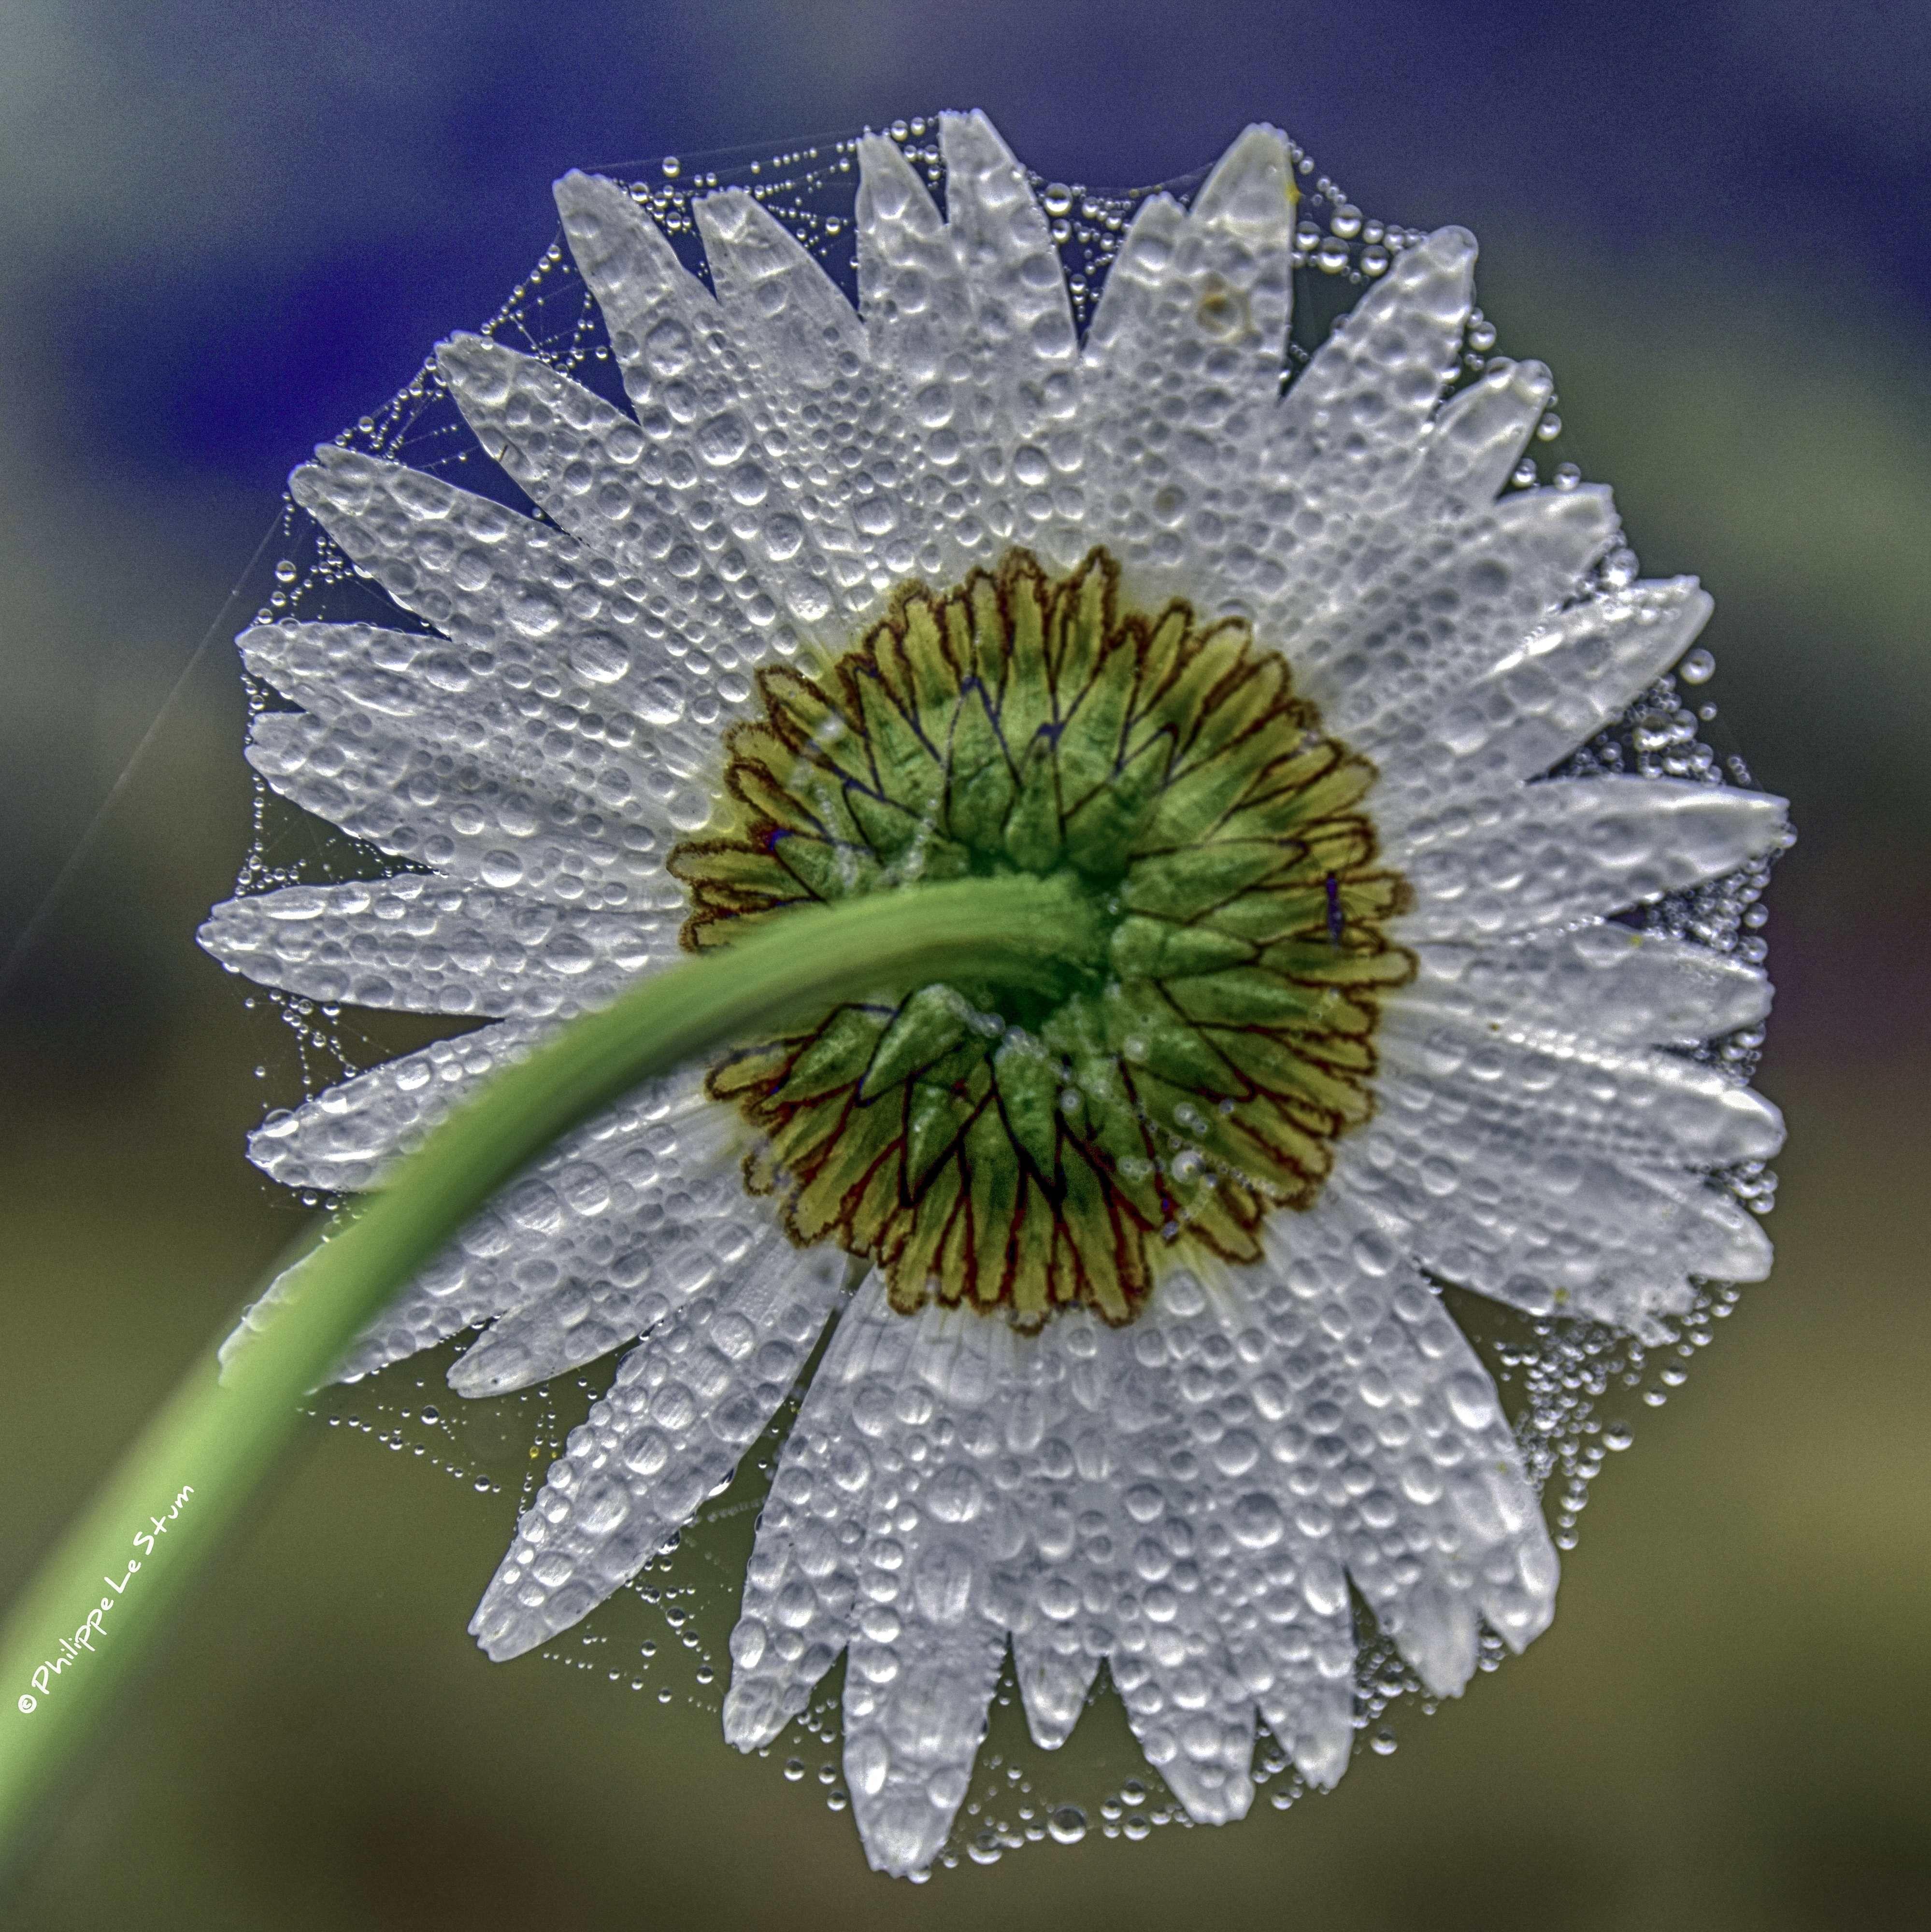 Almost Haunting Presque Envoûtante © Philippe Le Stum Photography #haunting #flowers #envoutante #web #toile #dew #rosée #photography #nature #macrophotography #PhilippeLeStum